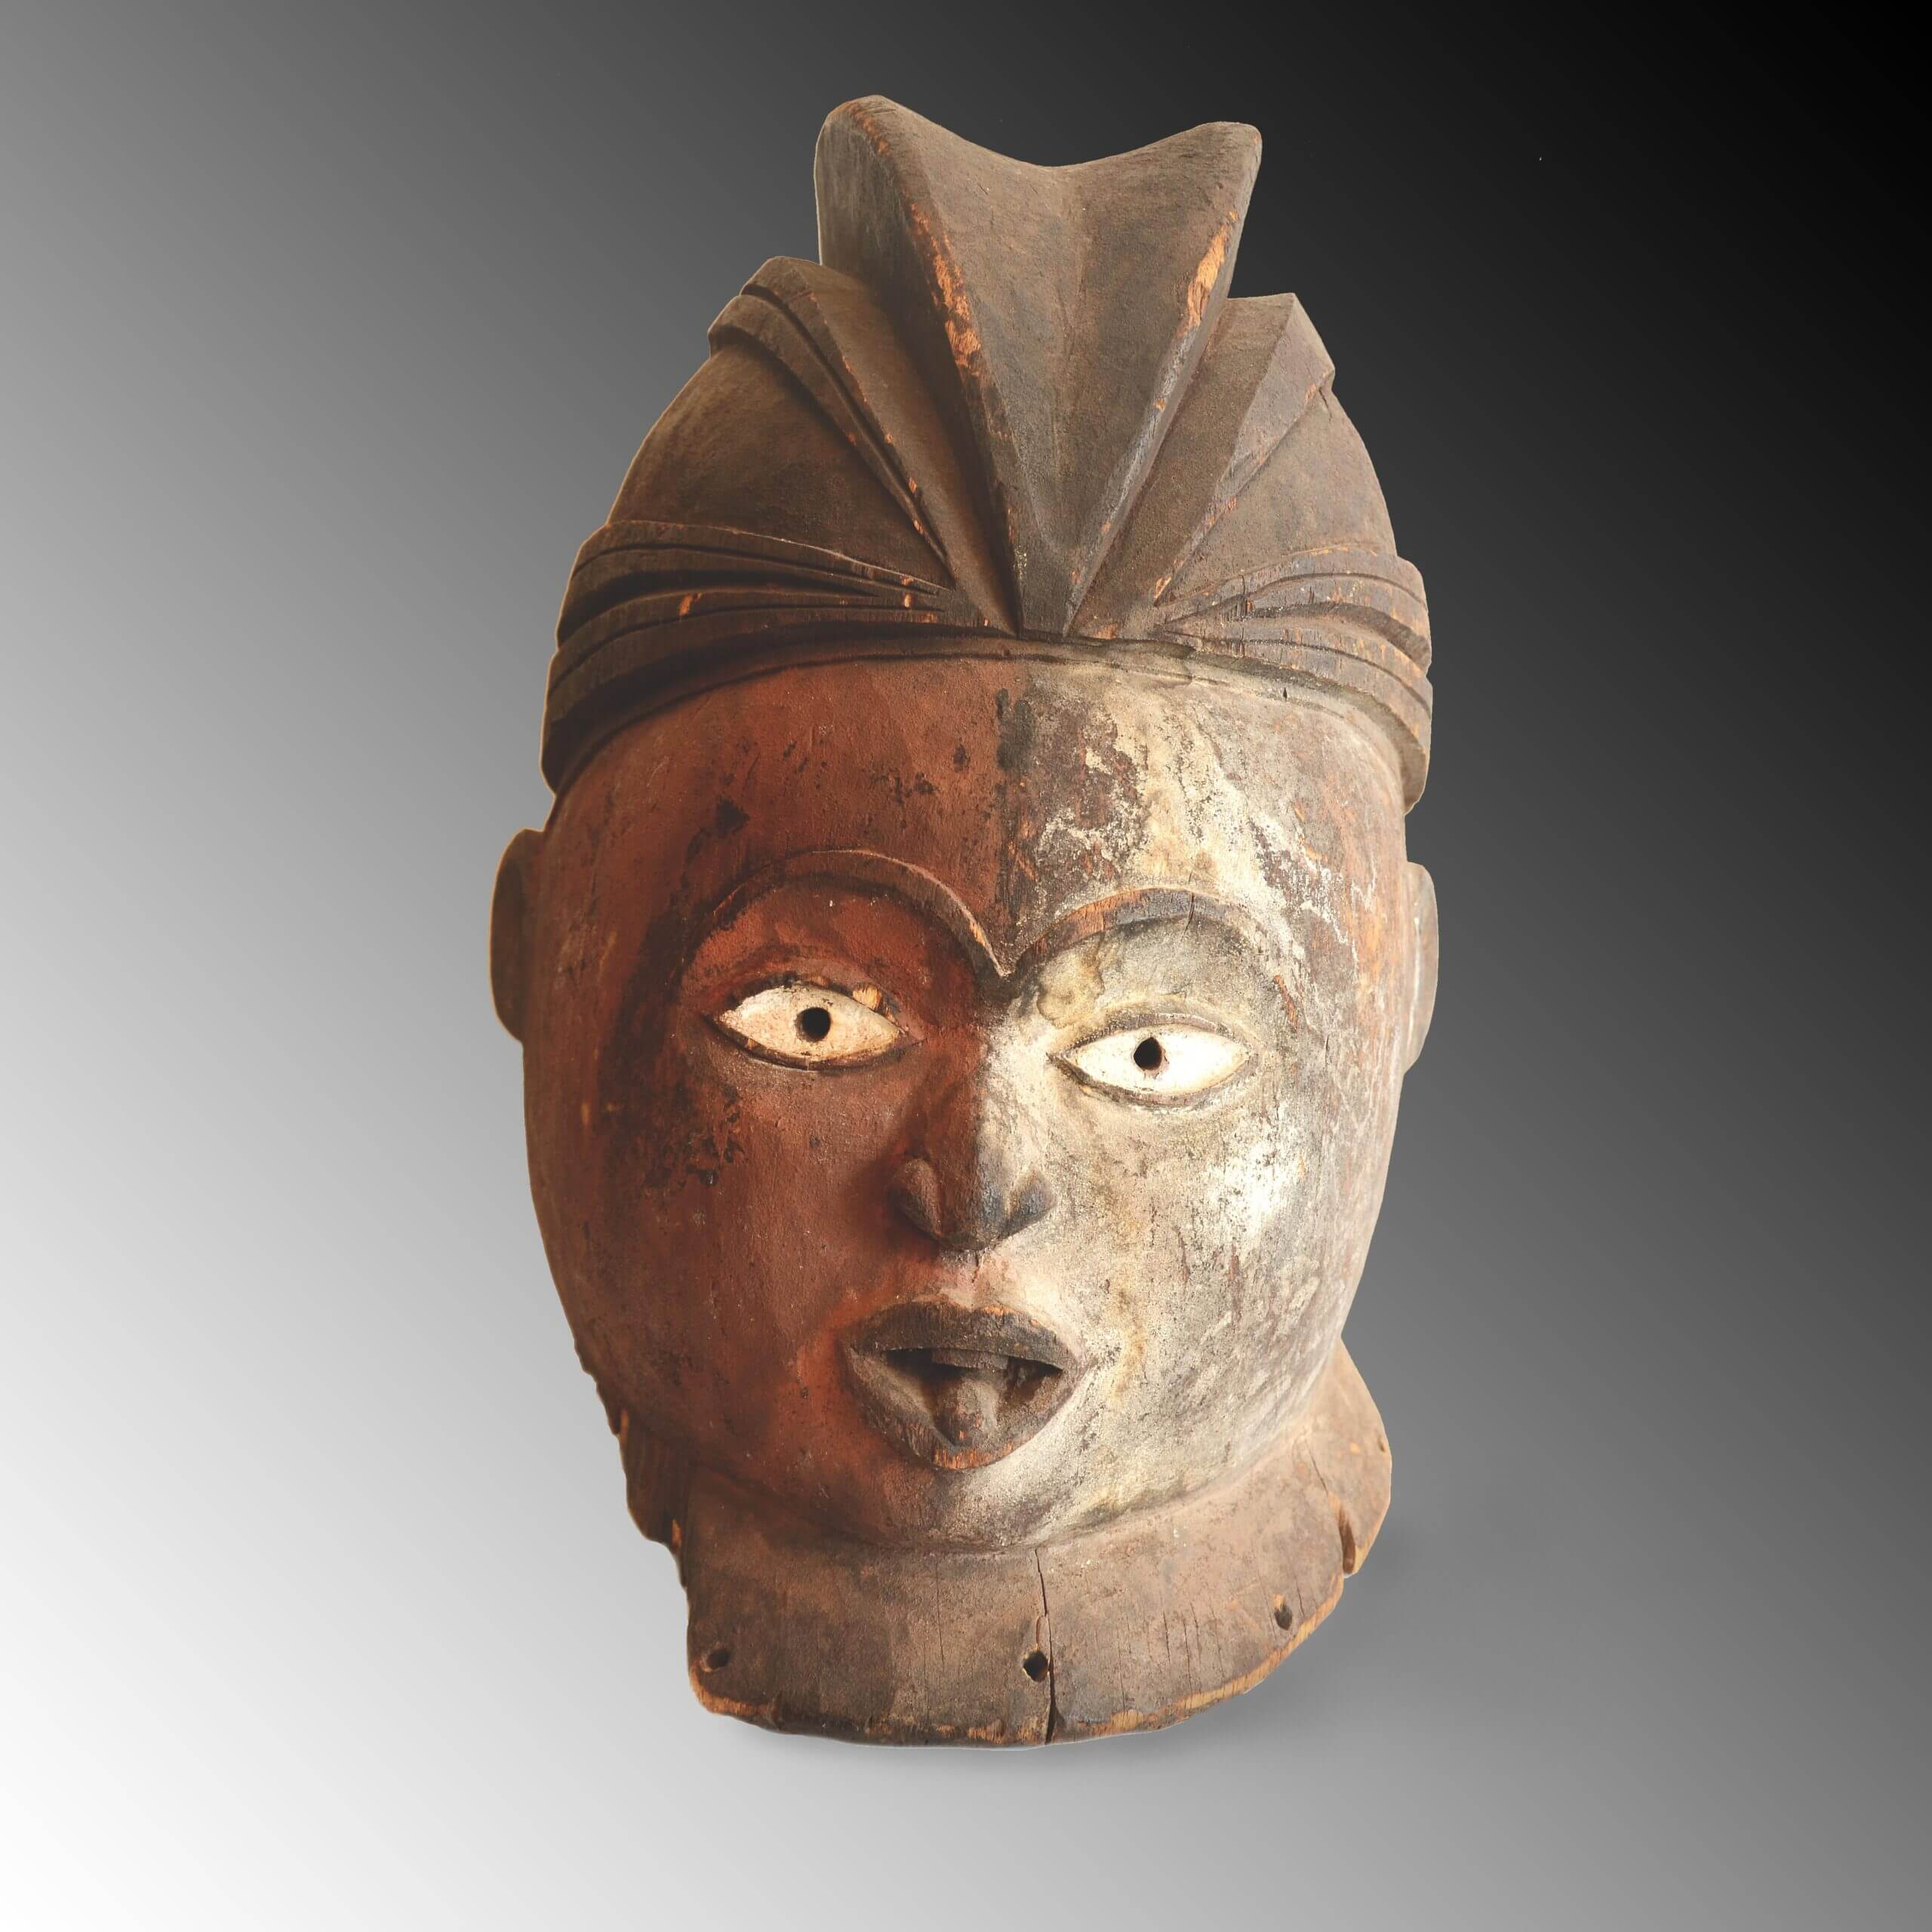 A Bavili mask